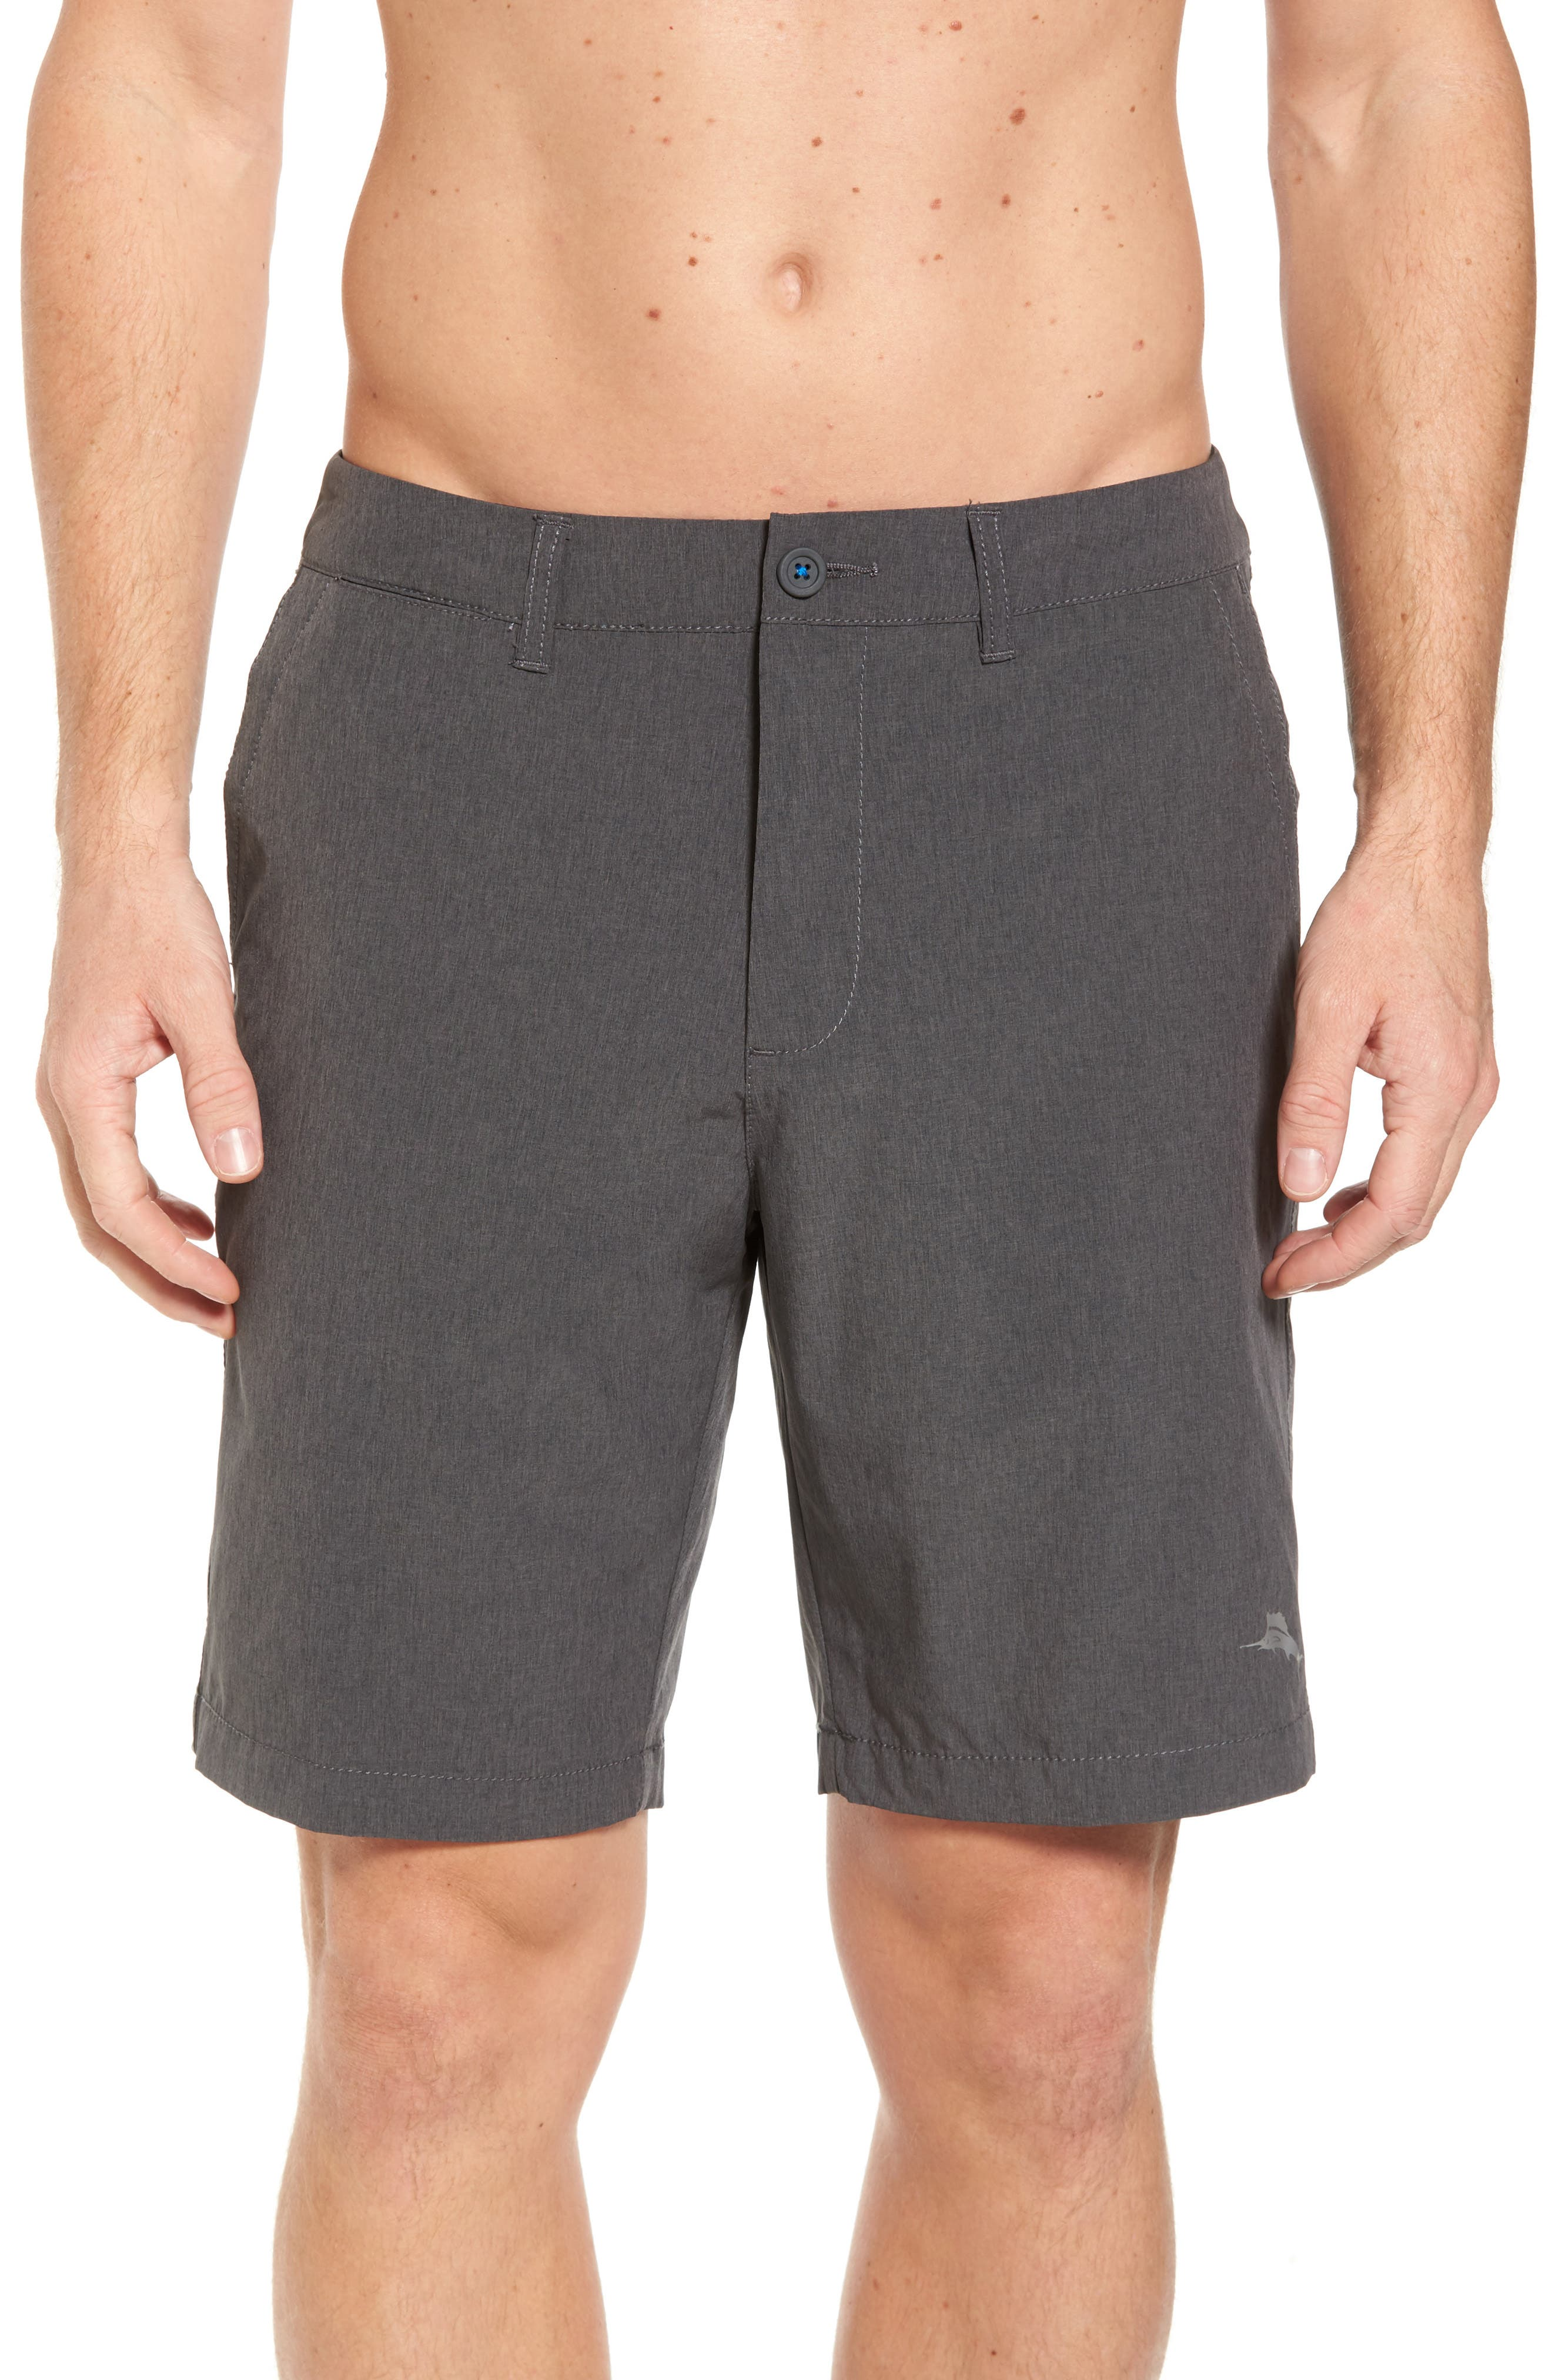 'Cayman Isles' Hybrid Swim Shorts,                             Main thumbnail 1, color,                             002